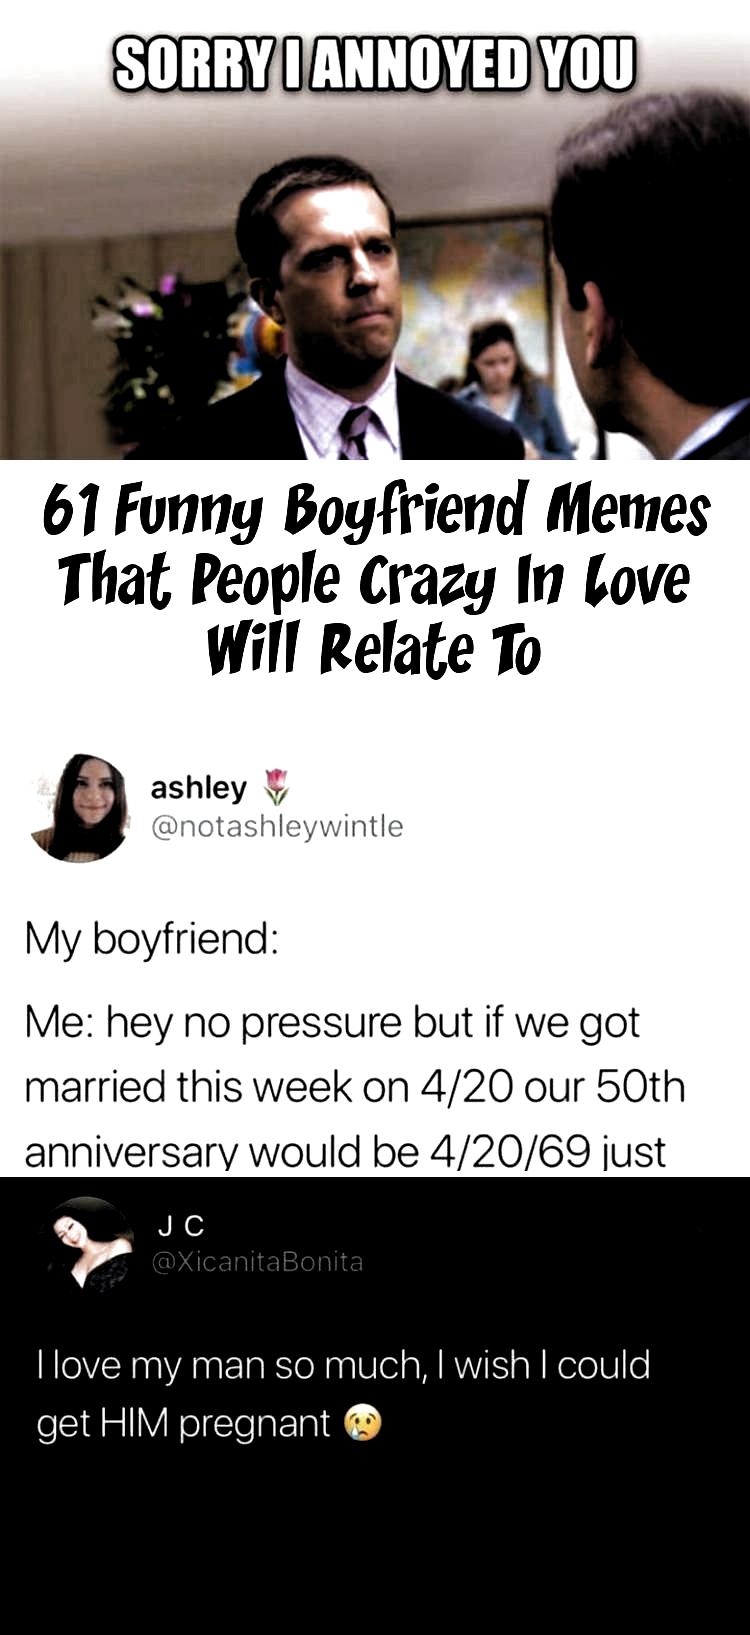 funny boyfriend memes relationships * funny boyfriend memes   funny boyfriend memes humor   funny boyfriend memes